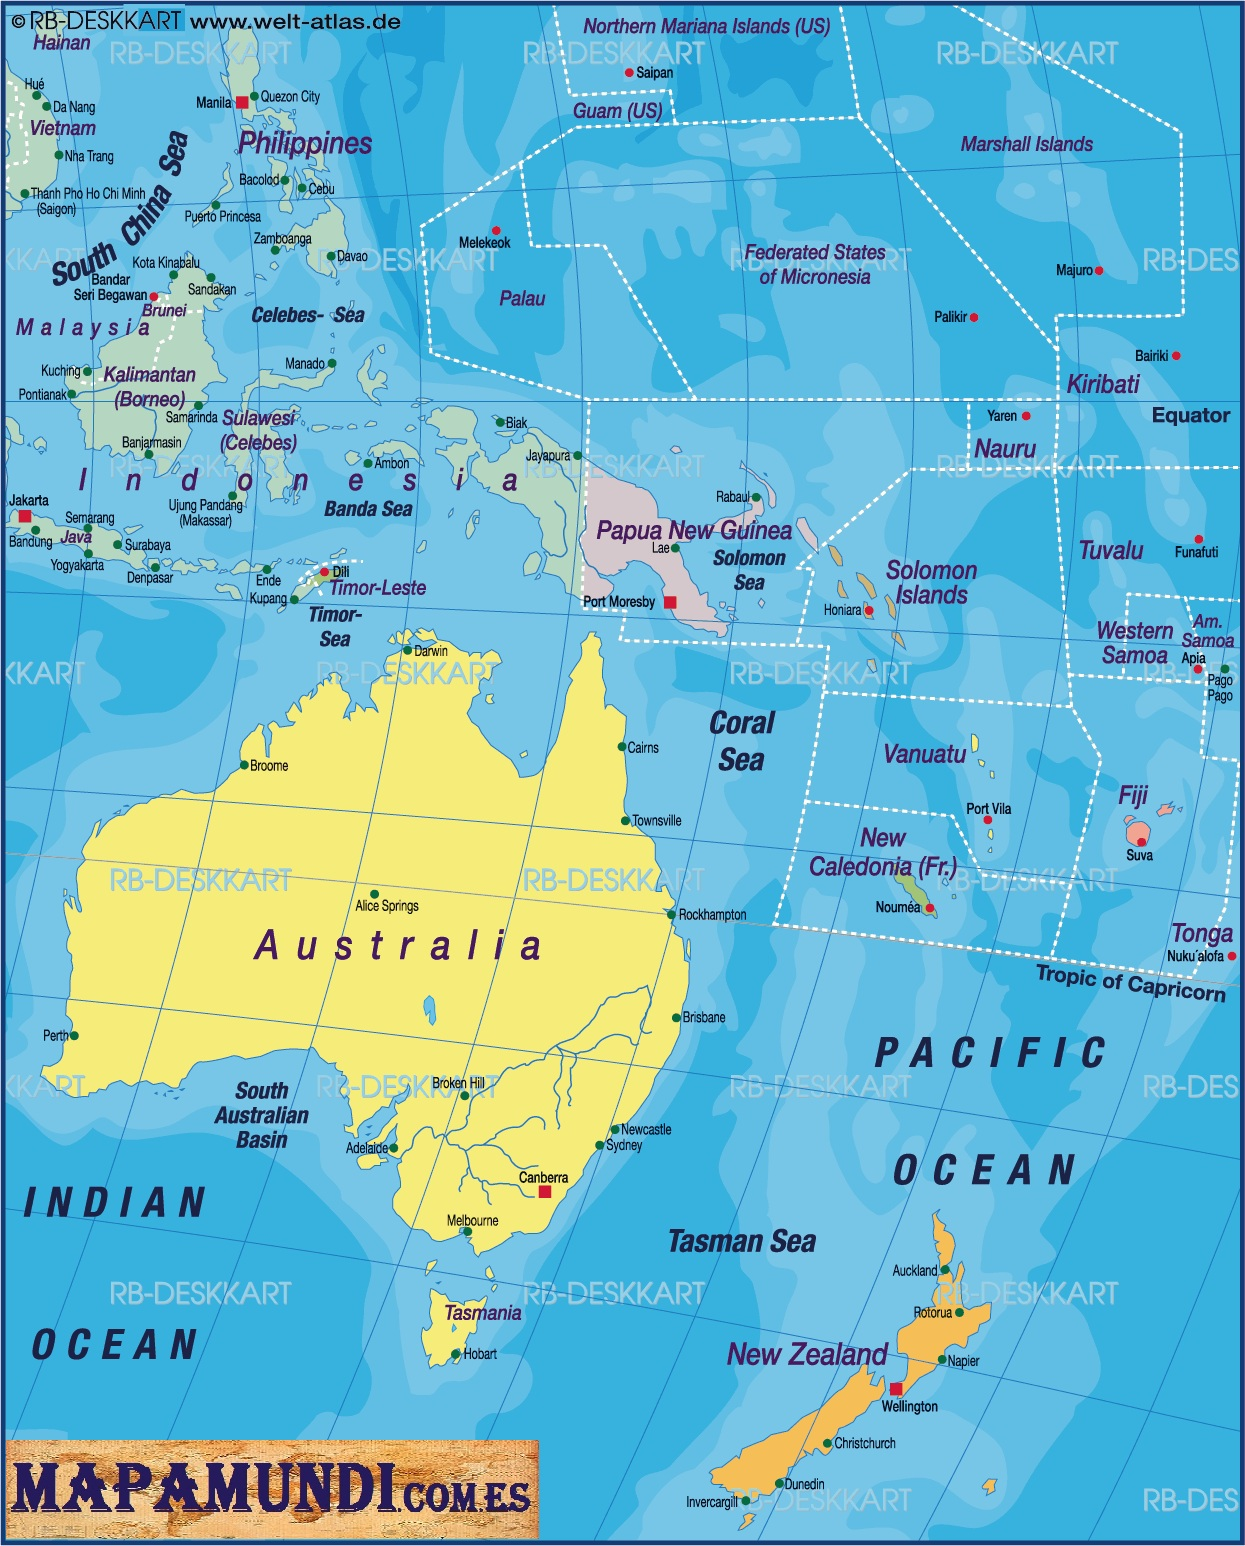 Mapamundi Mapas Del Mundo Y Mucho Mas Mapamundi Mapa De